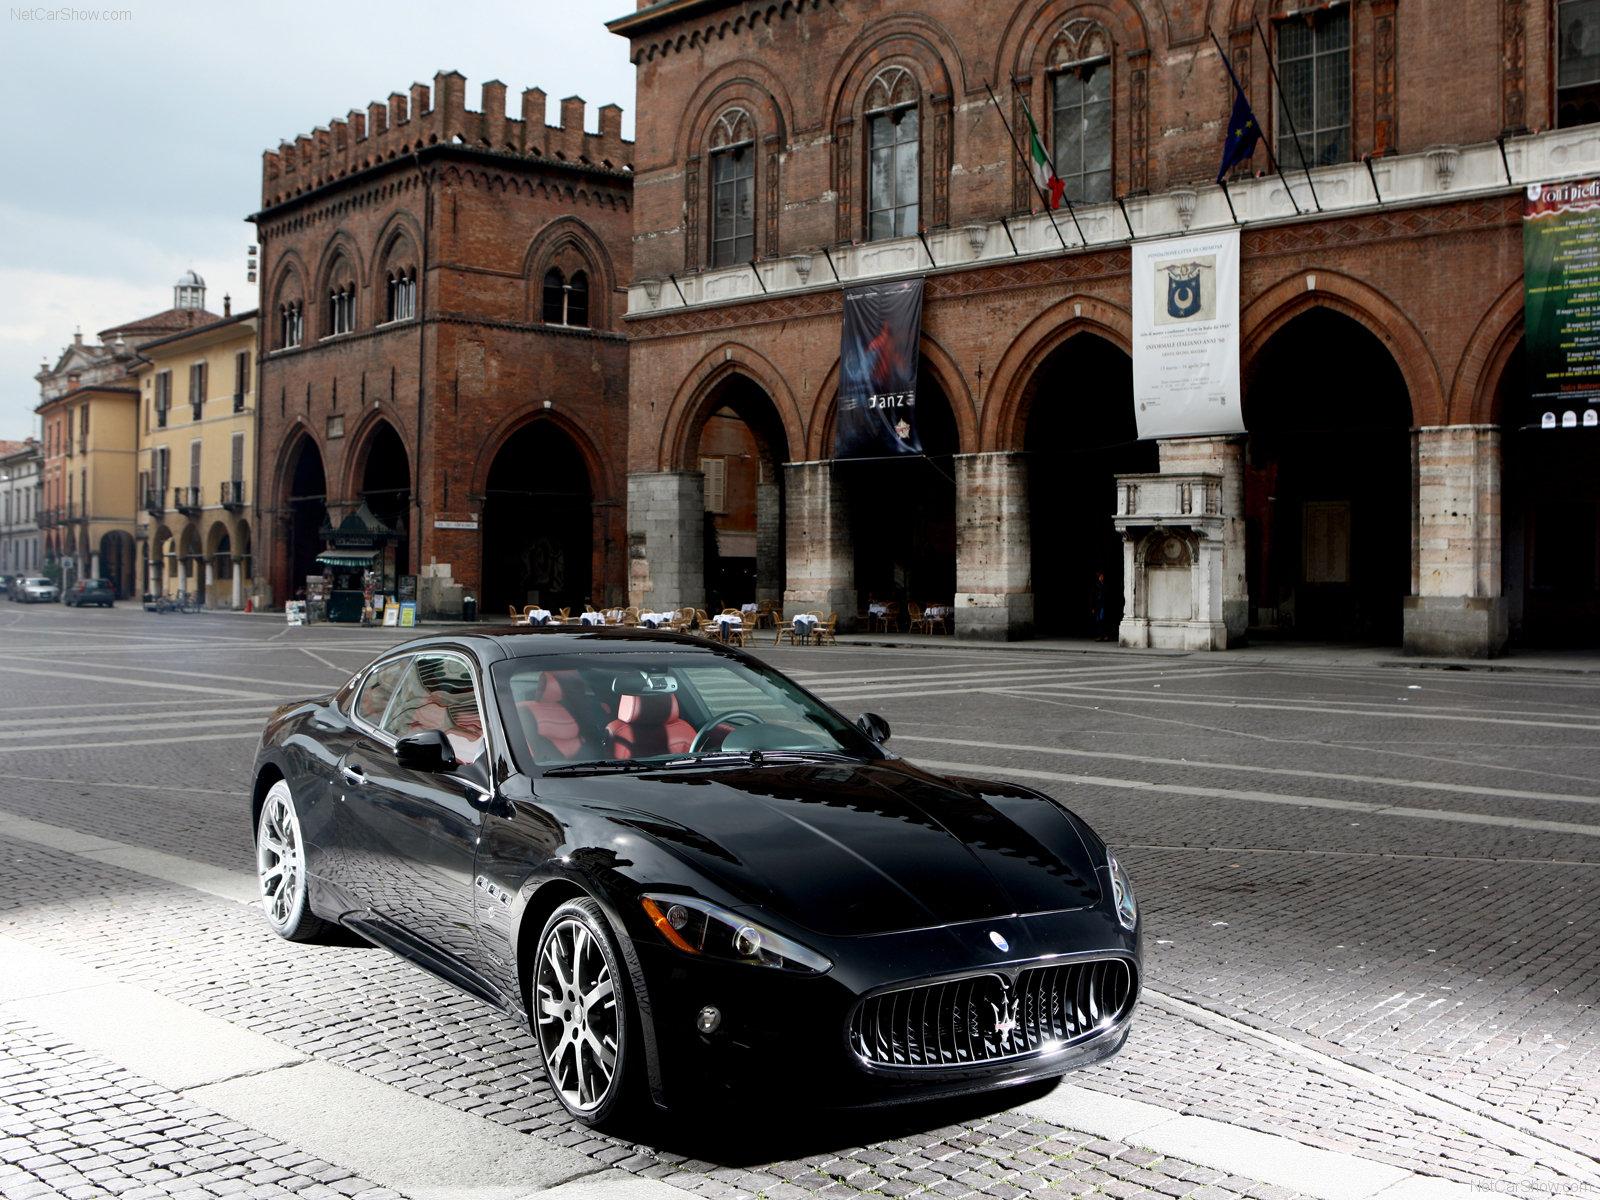 Hình ảnh siêu xe Maserati GranTurismo S 2009 & nội ngoại thất